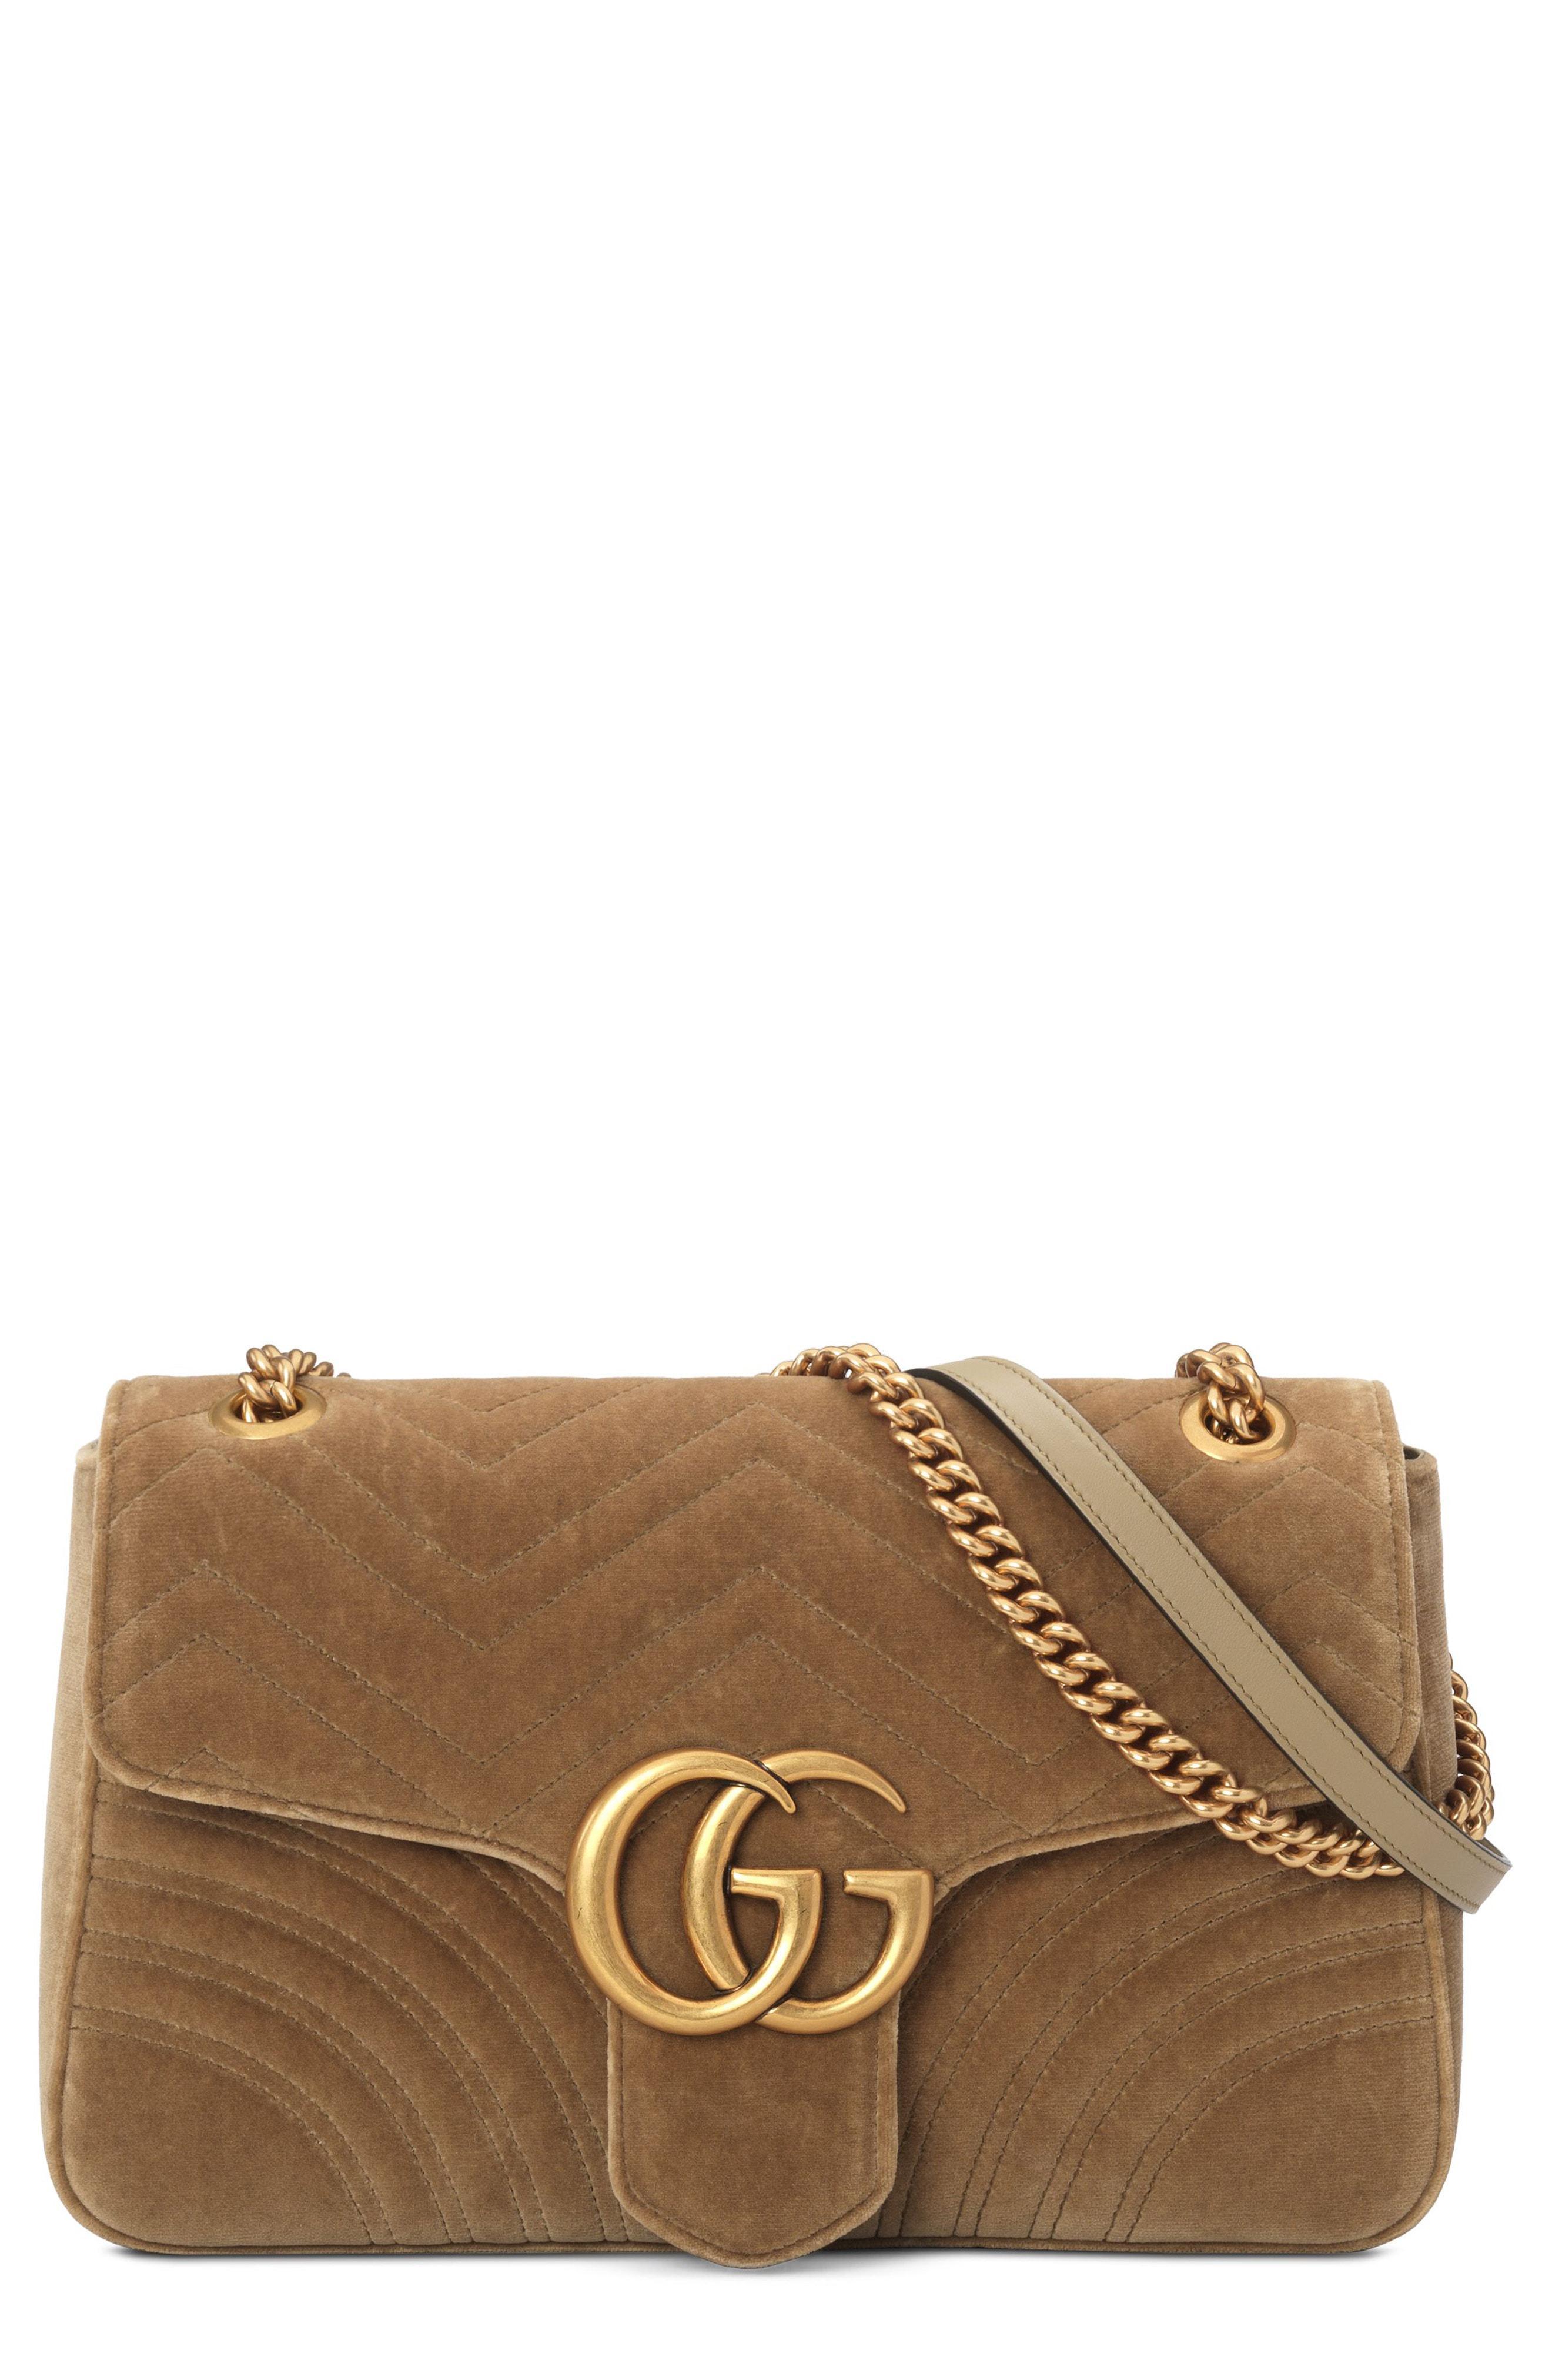 61283d74 Gucci Medium Gg Marmont 2.0 Matelasse Velvet Shoulder Bag in Brown ...